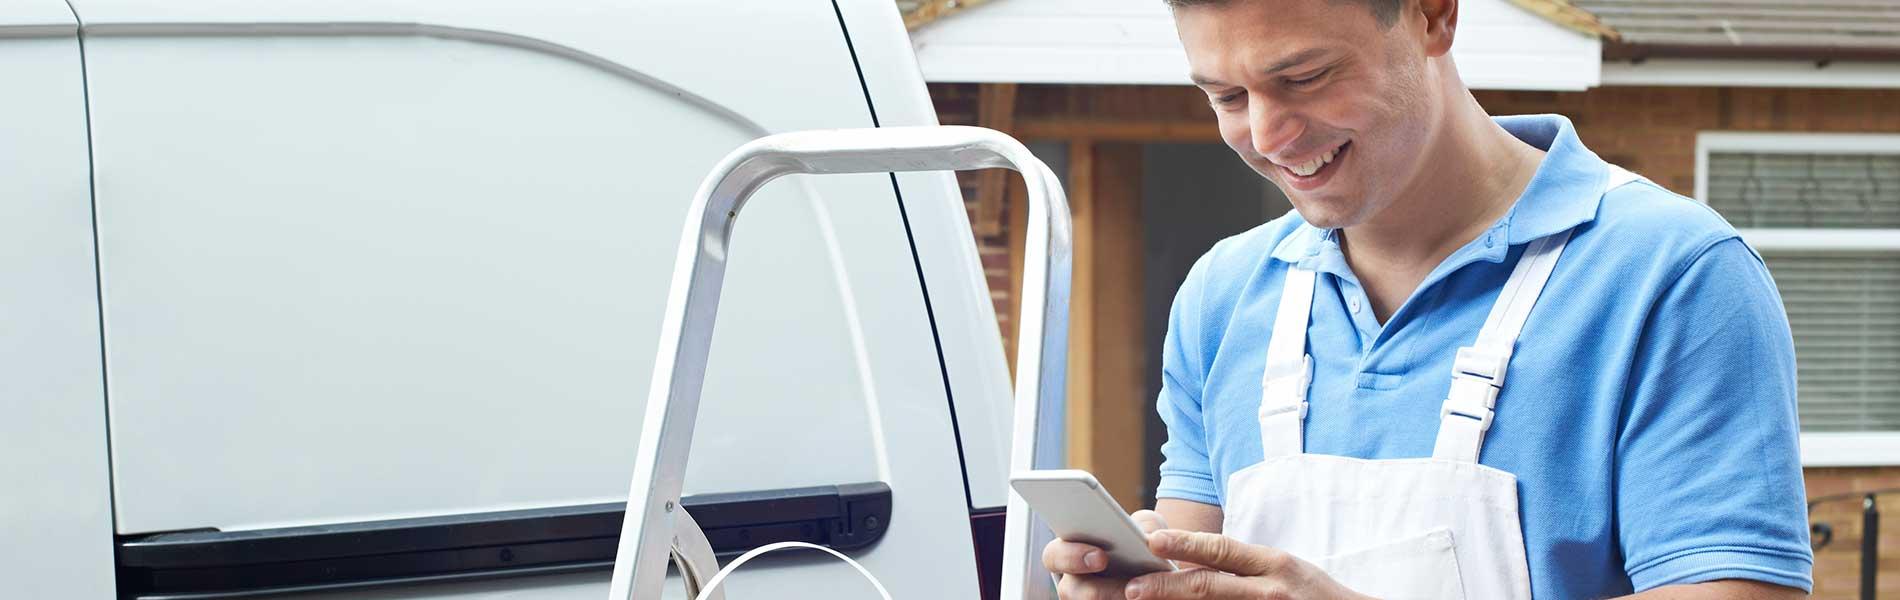 Microsoft Dynamics 365 field service Office 365 - man on the go